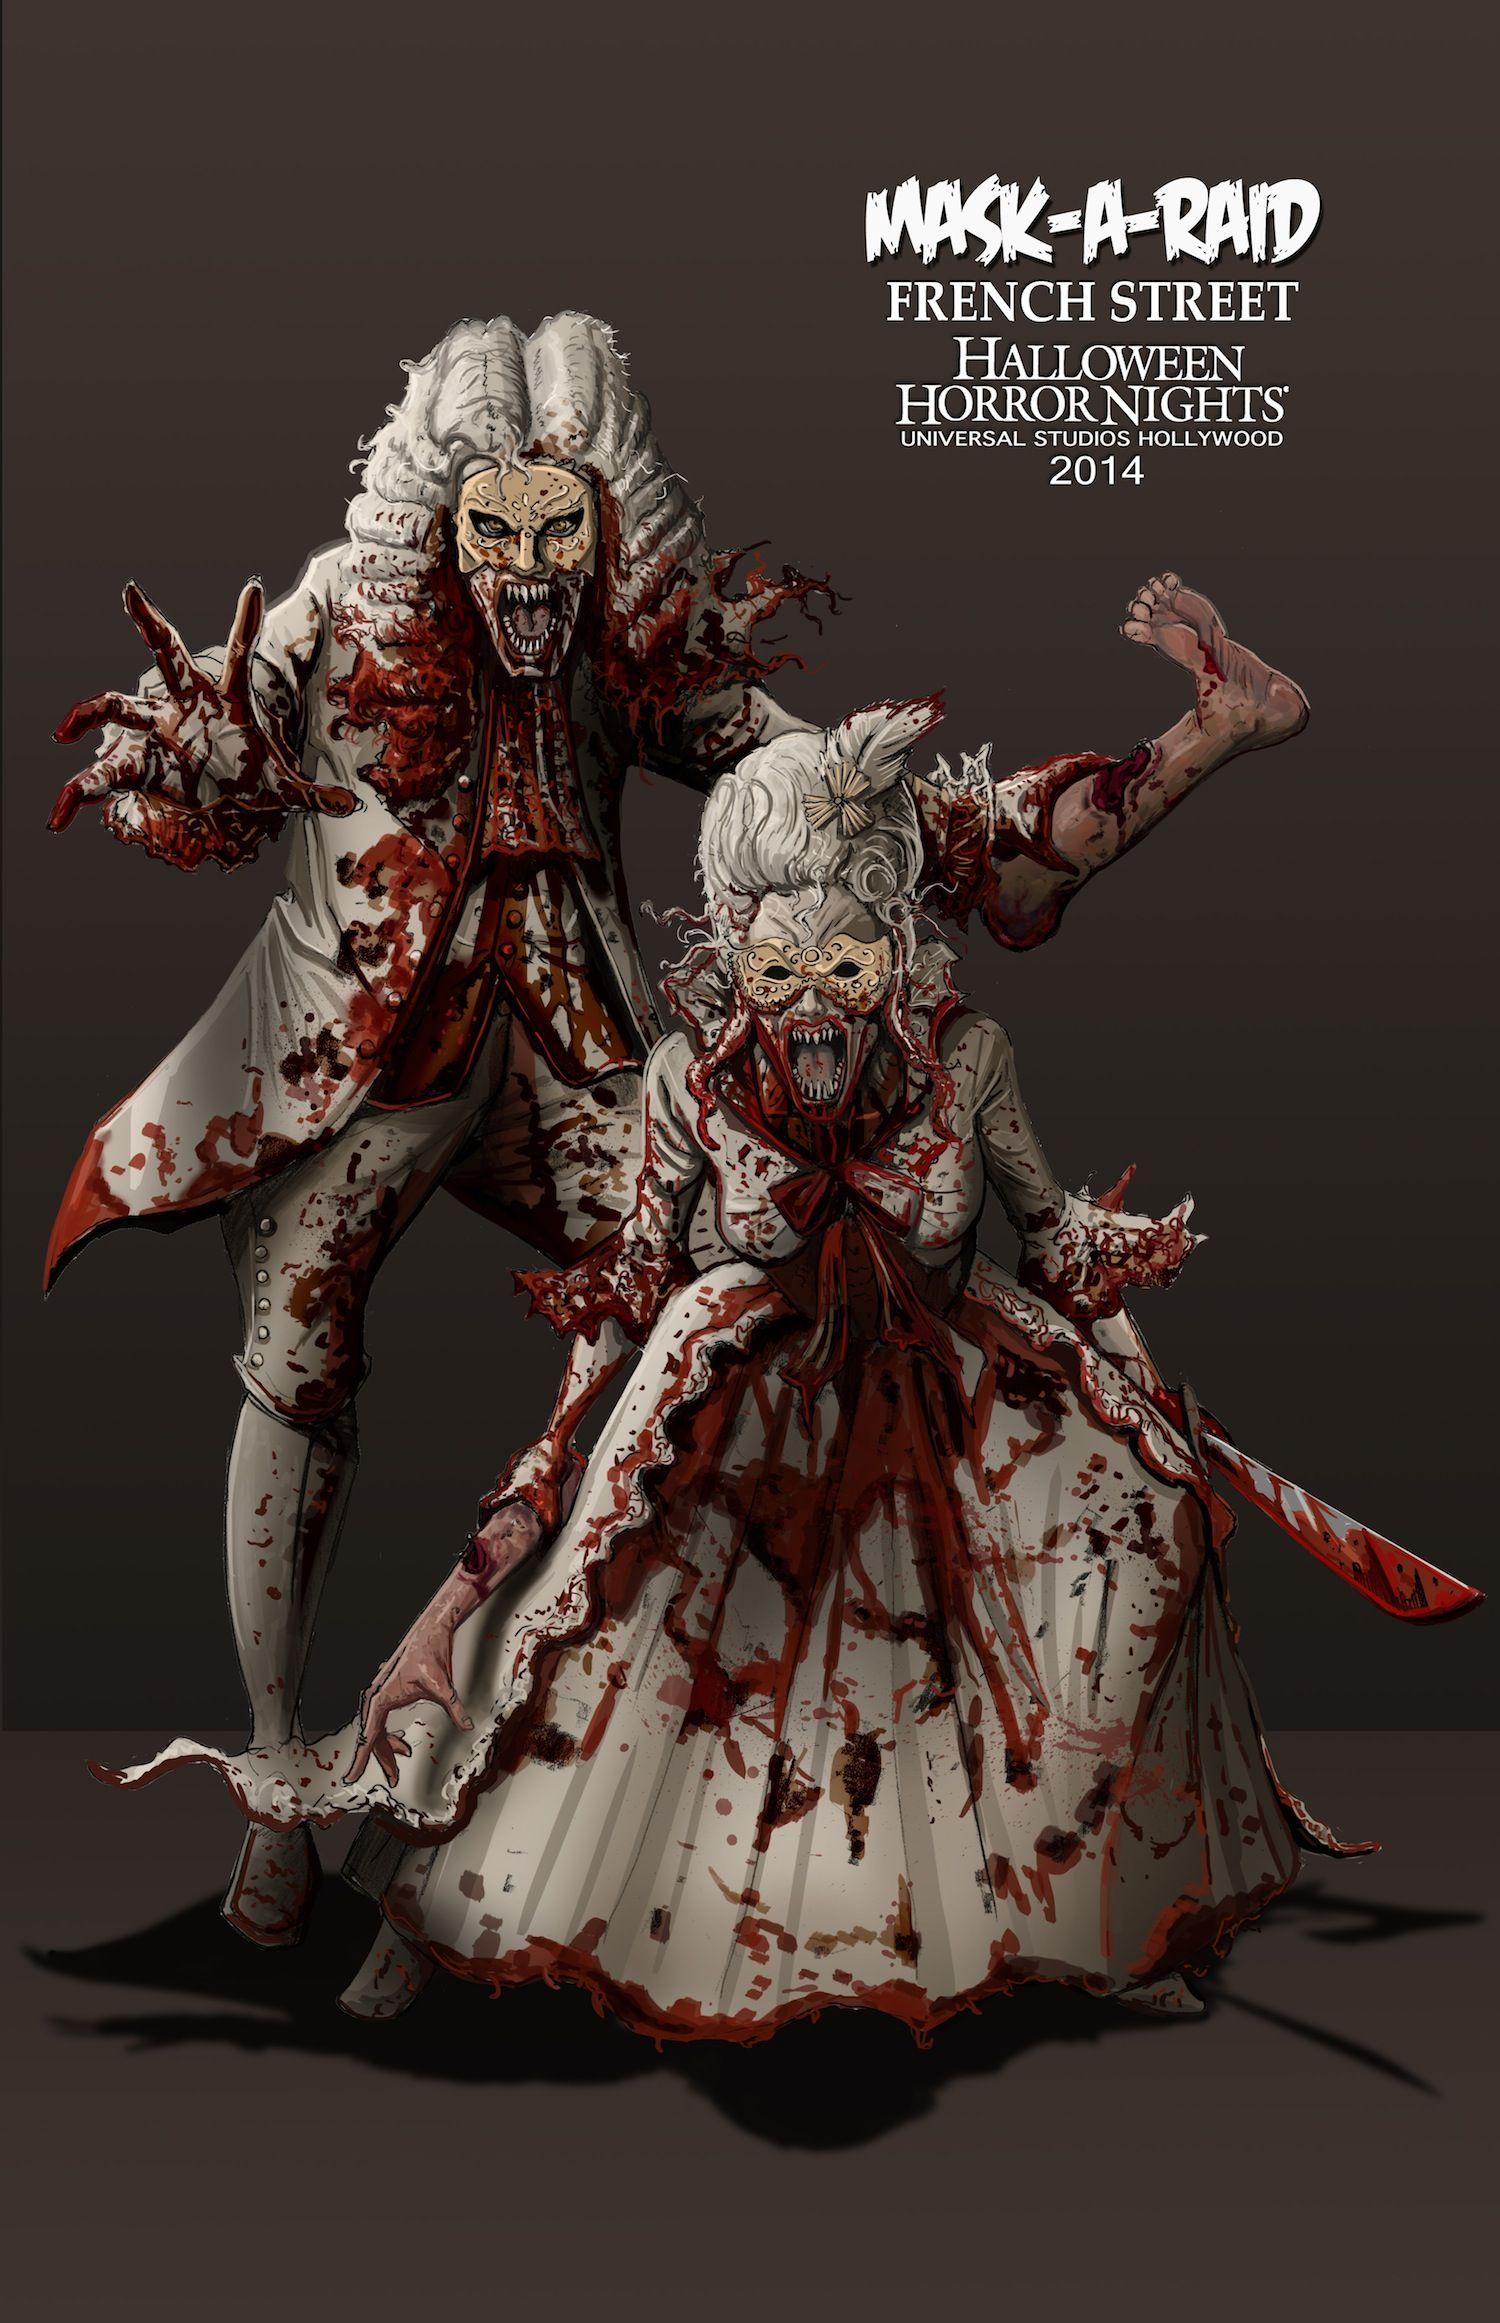 Universal Studios Hollywood's Halloween Horror Nights 2014 will be ...